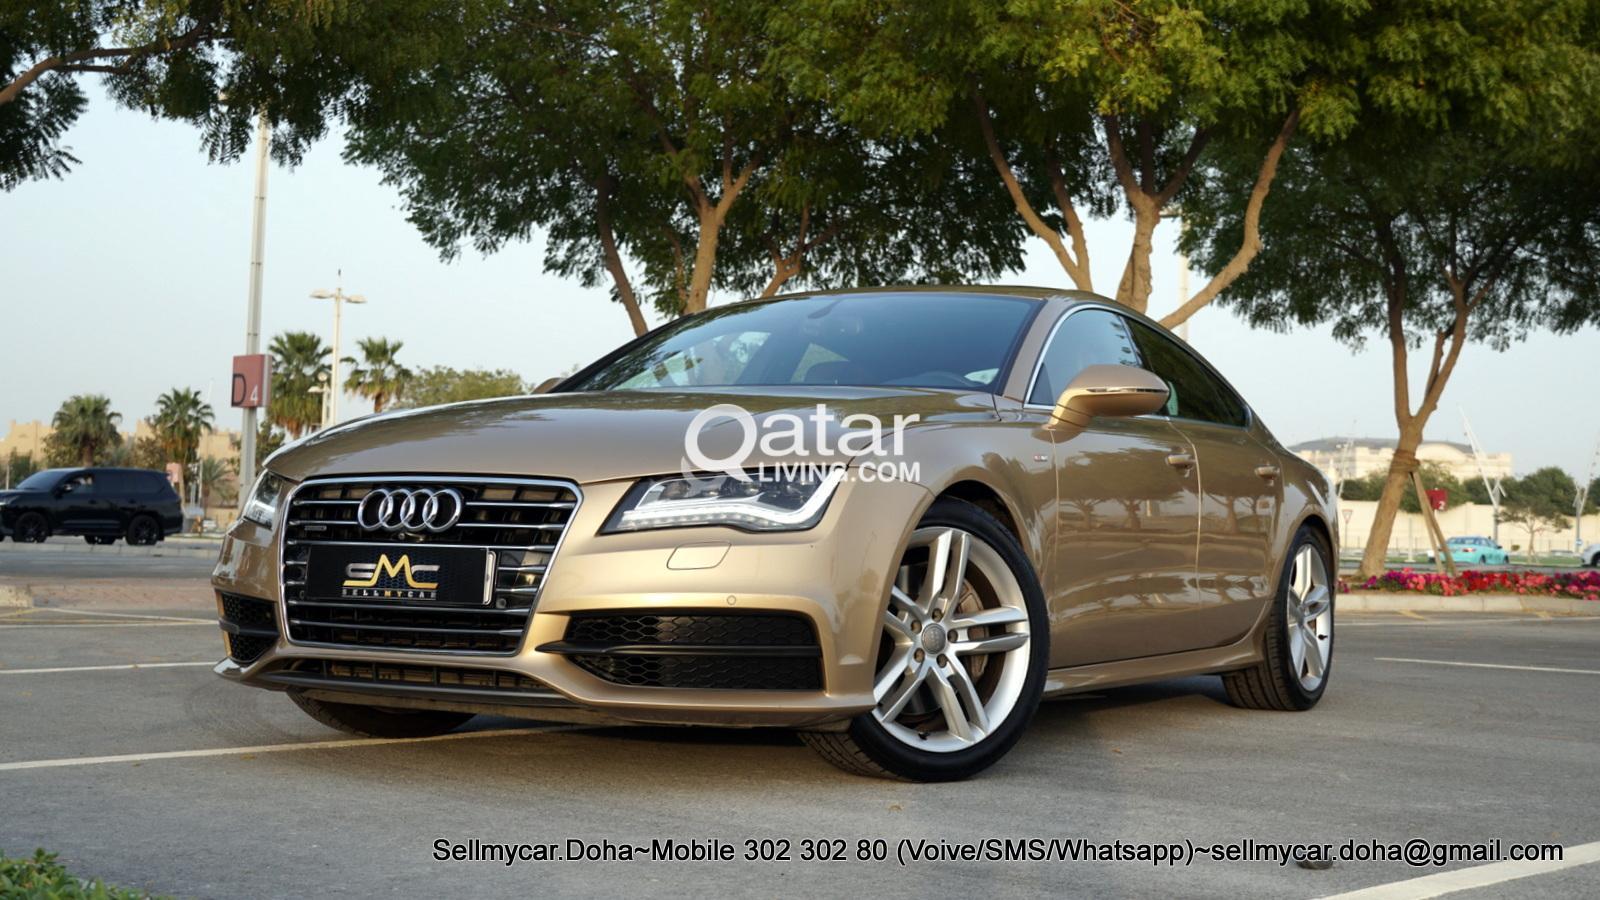 2013 Audi A7 Quattro 3.0t S-Line (Many More Photos